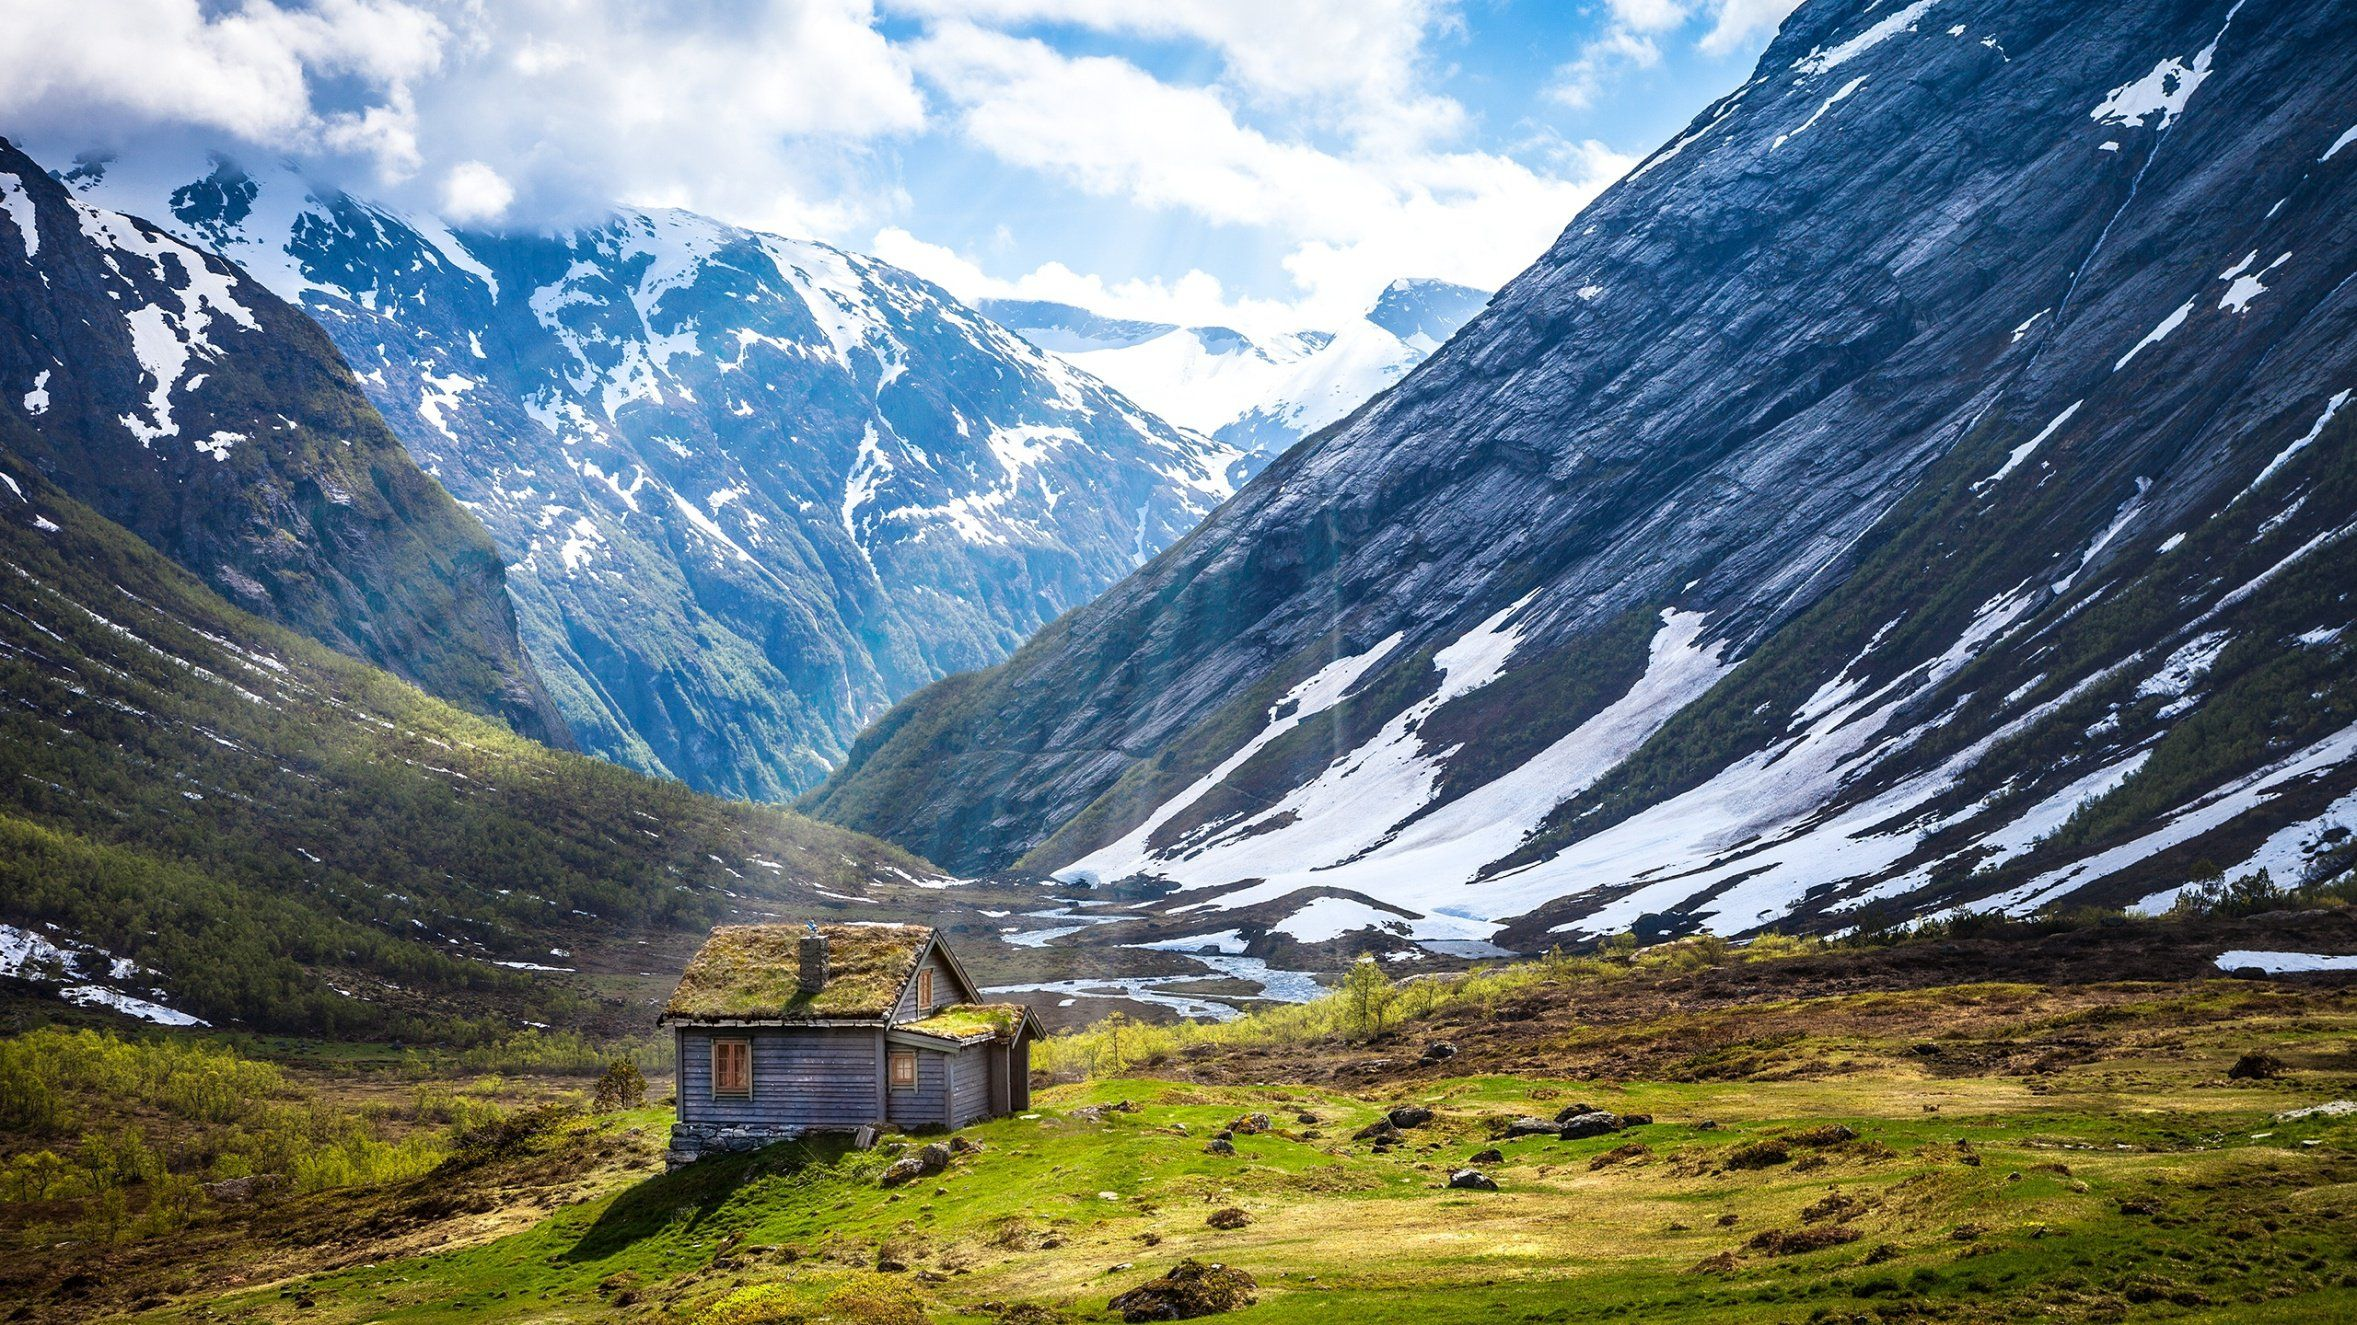 25 Espectaculares Fondos De Pantalla Hd De Paisajes Landscape Wallpaper Mountain Wallpaper Norway Wallpaper